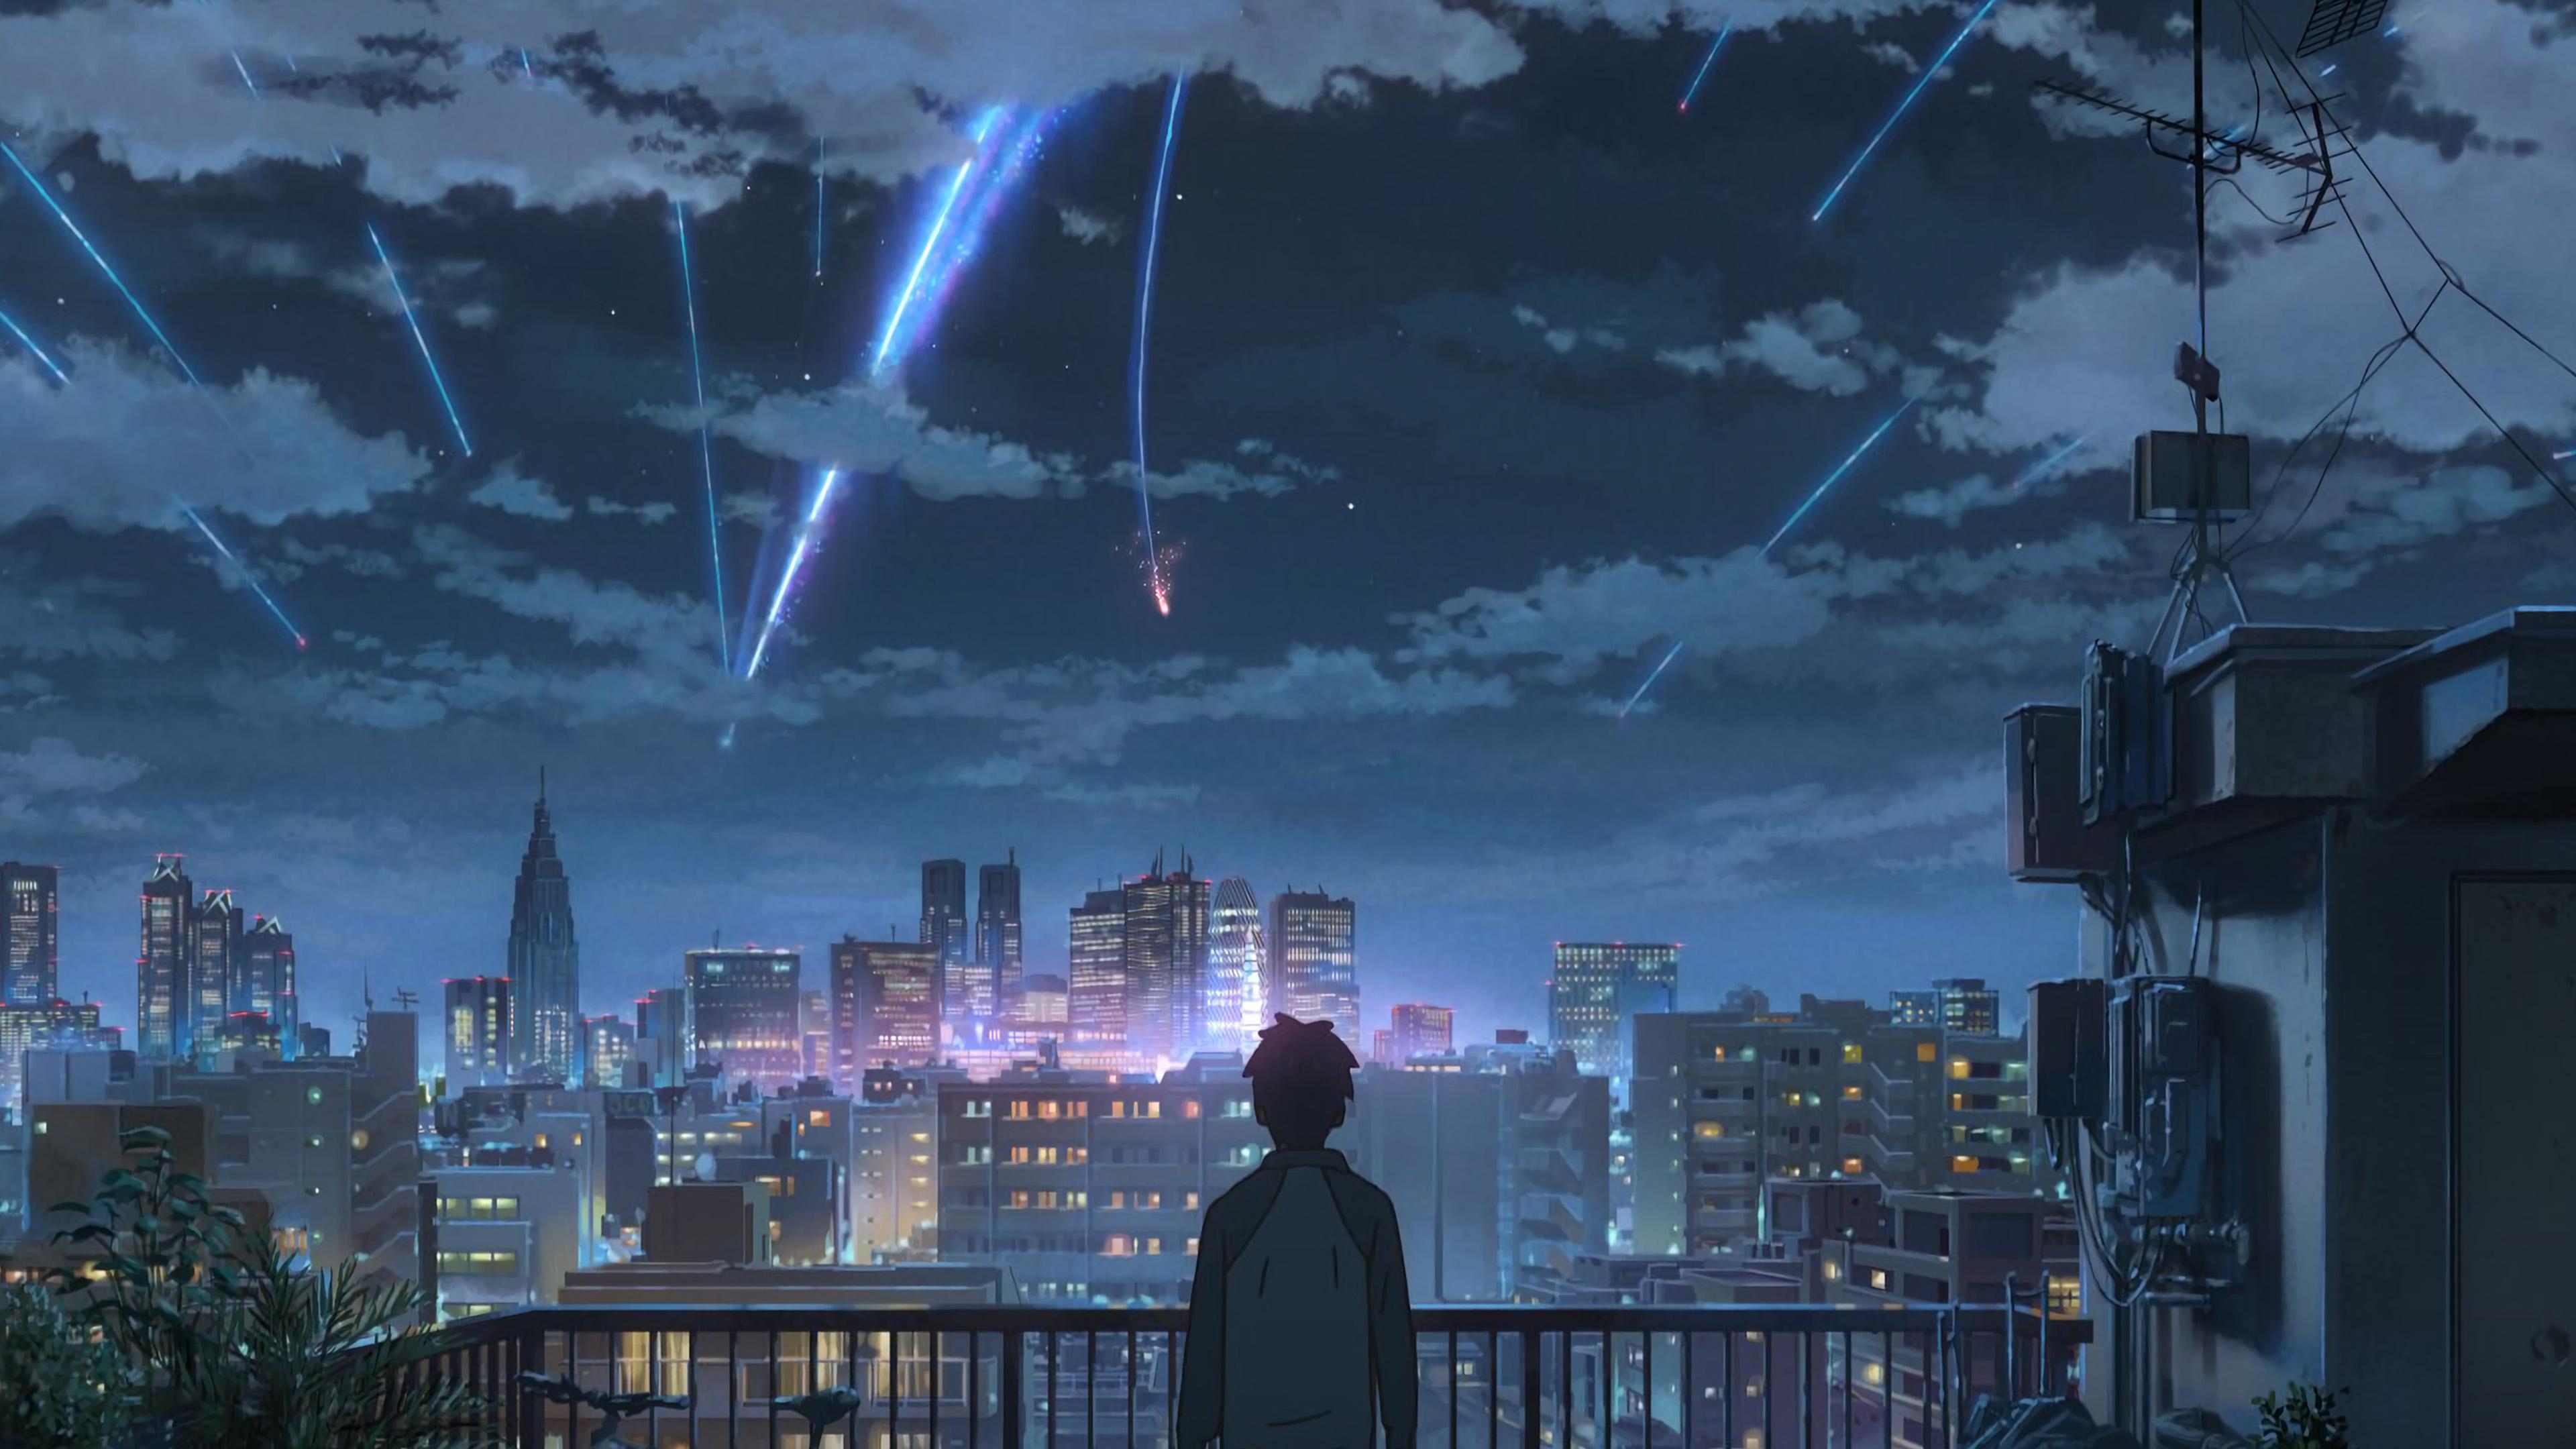 http://uupload.ir/files/h9bo_papers.co-aw28-yourname-night-anime-sky-illustration-art-35-3840x2160-4k-wallpaper.jpg